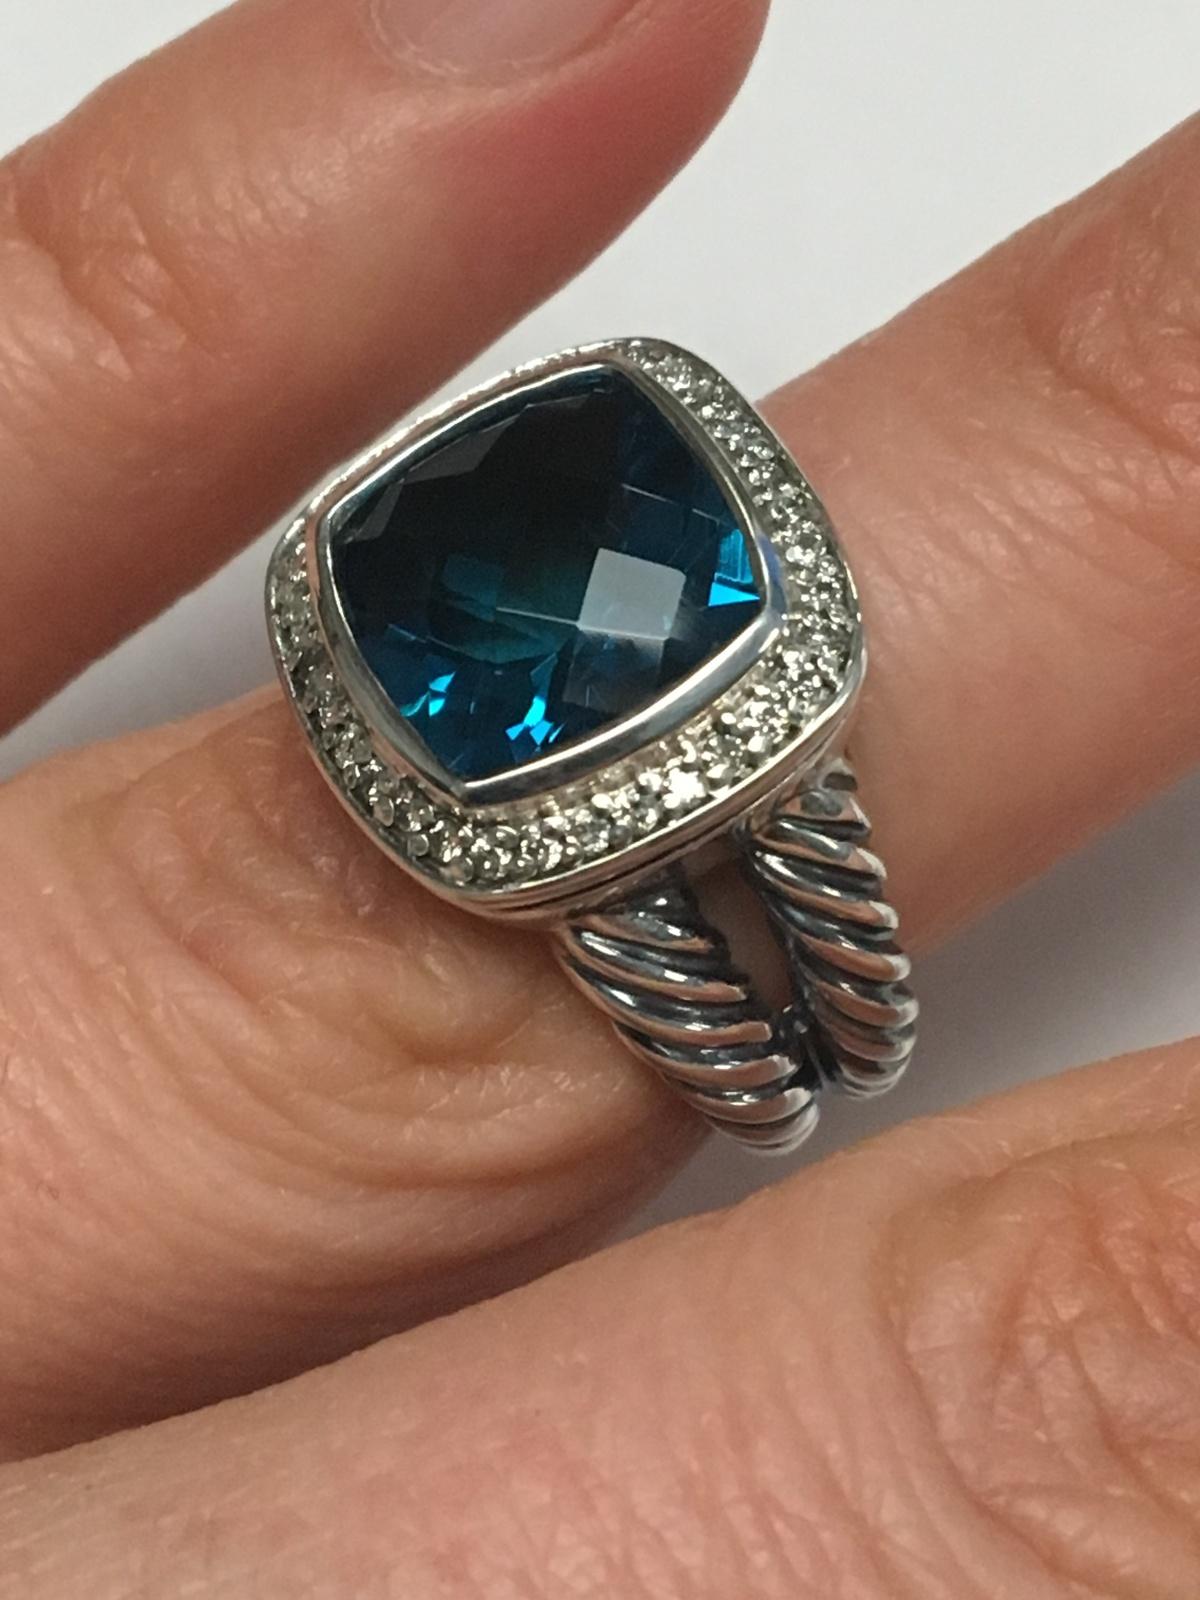 Pre Owned David Yurman 11mmx11mm Albion Hampton Topaz and Diamond Ring Size 6